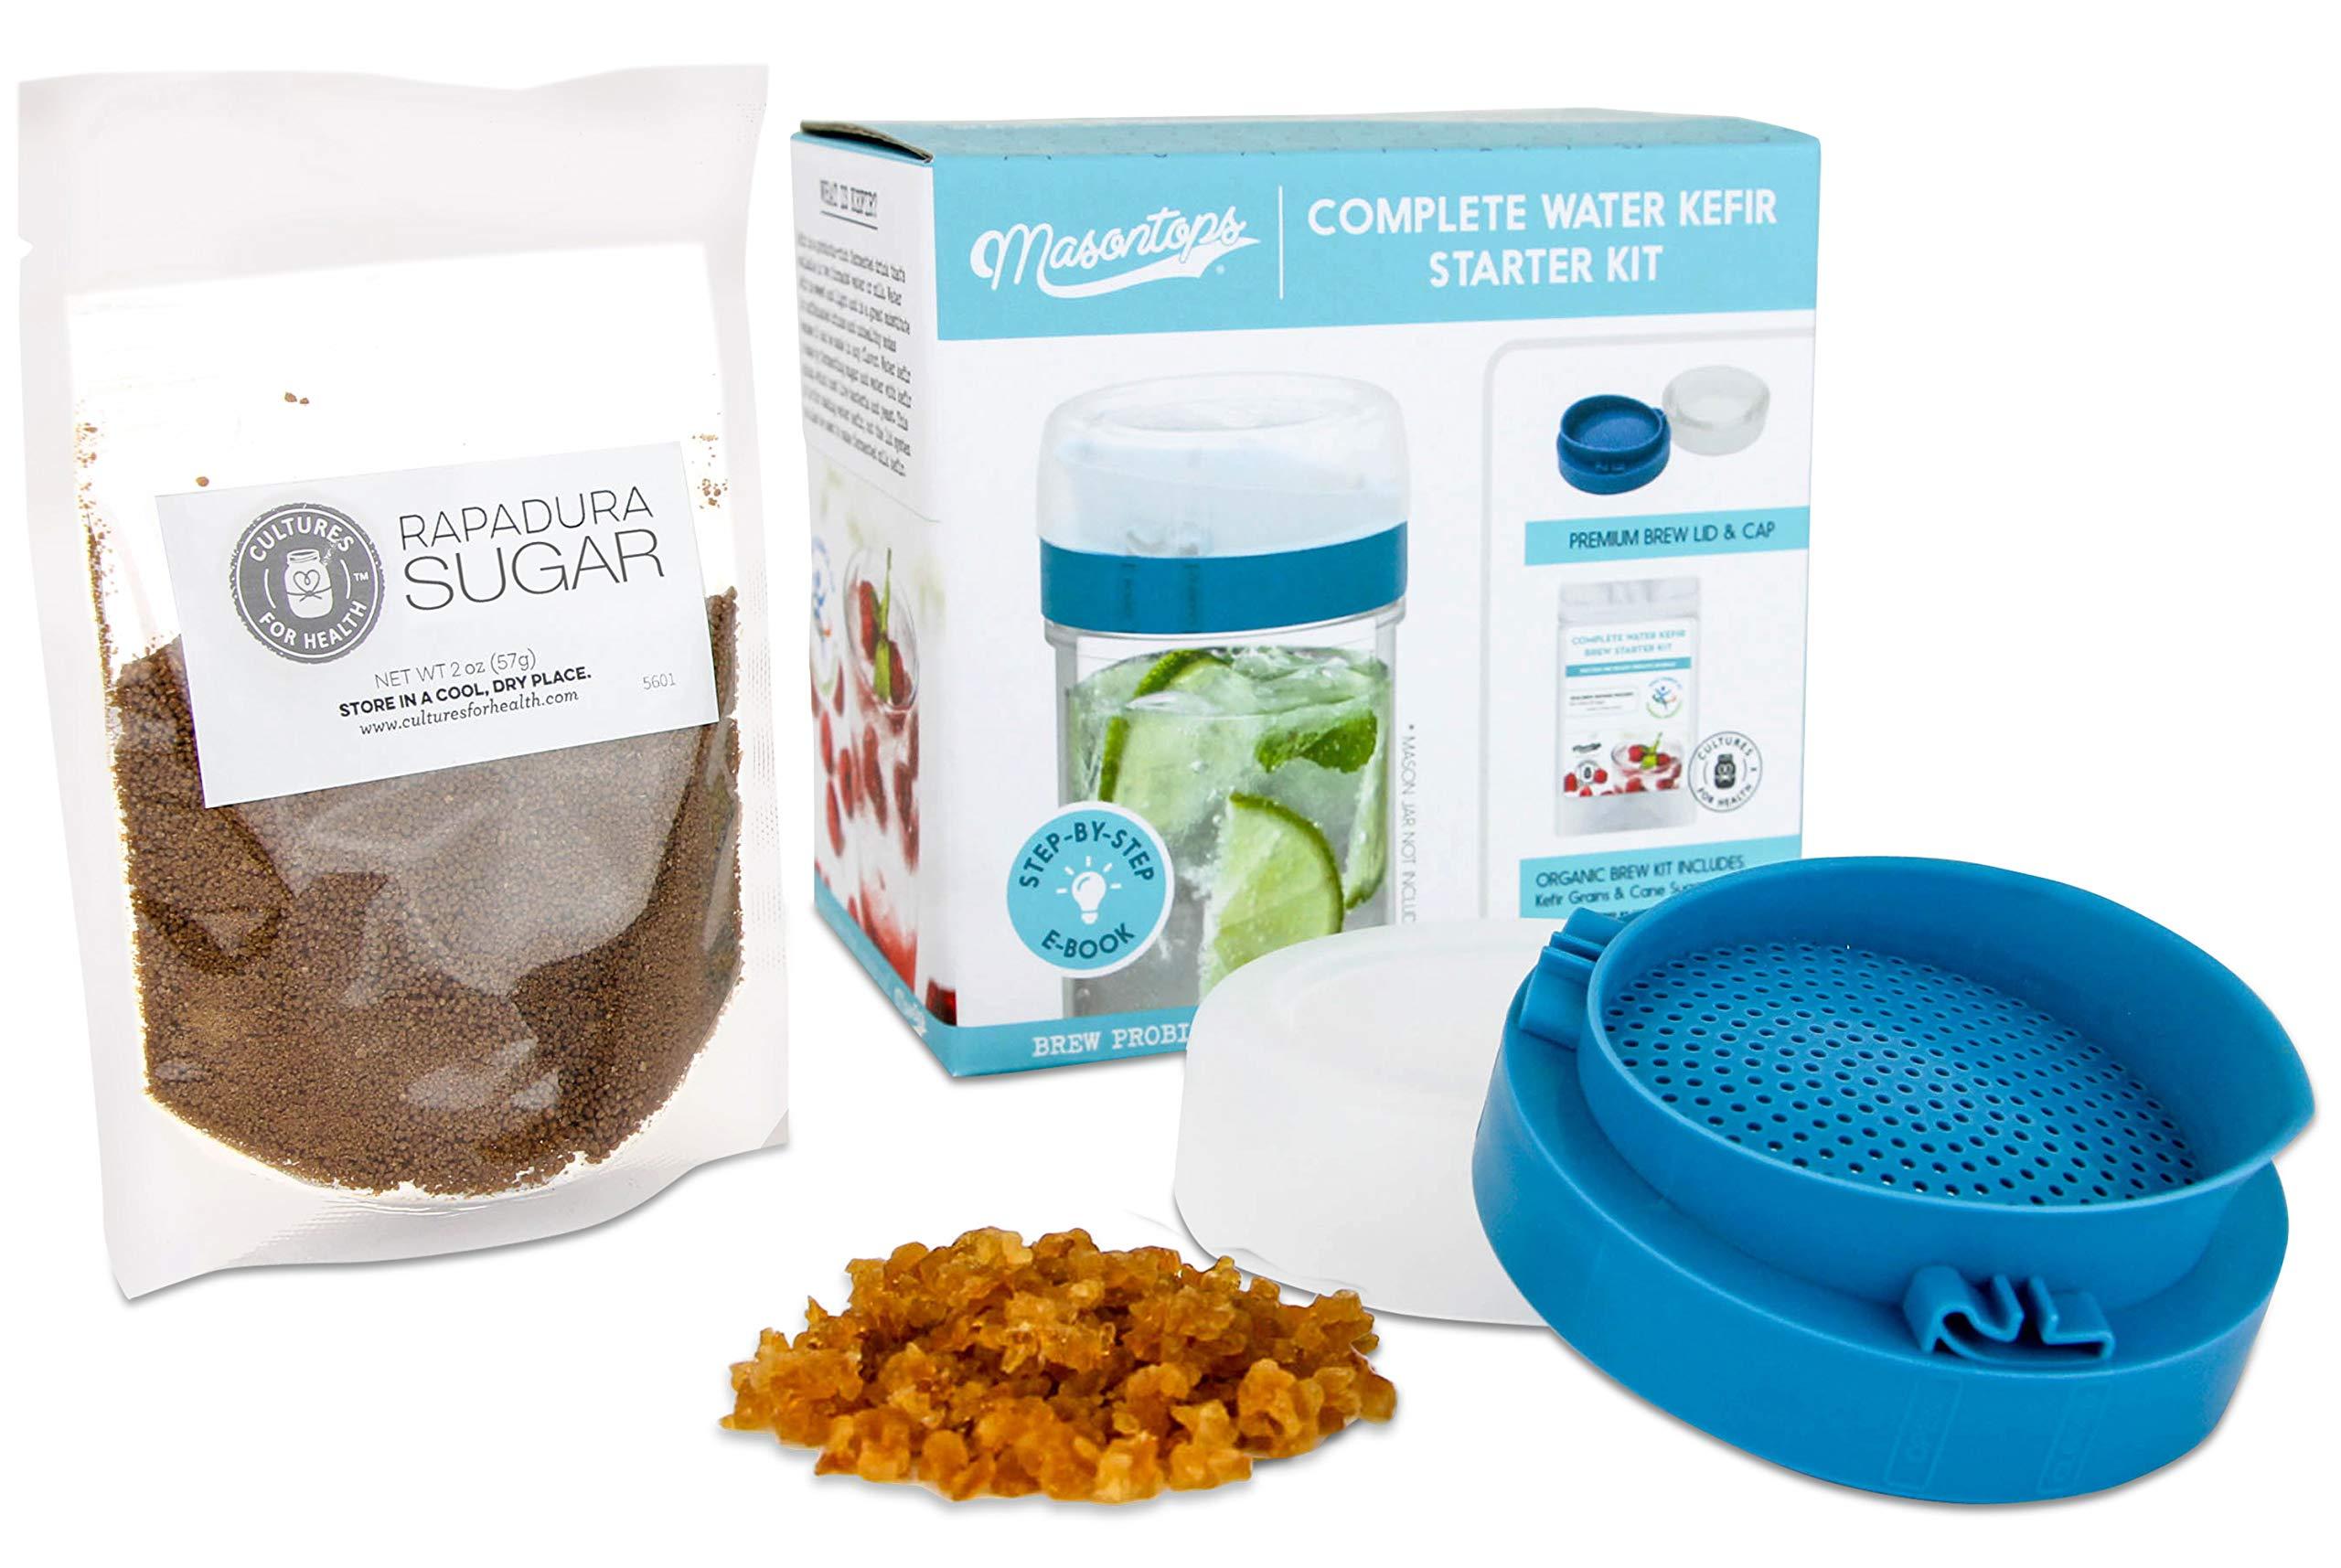 Masontops Complete Kefir Making Starter Kit - With Plastic Strainer Cap, Starter Fermentation Grains & Specialty Sugar by Masontops